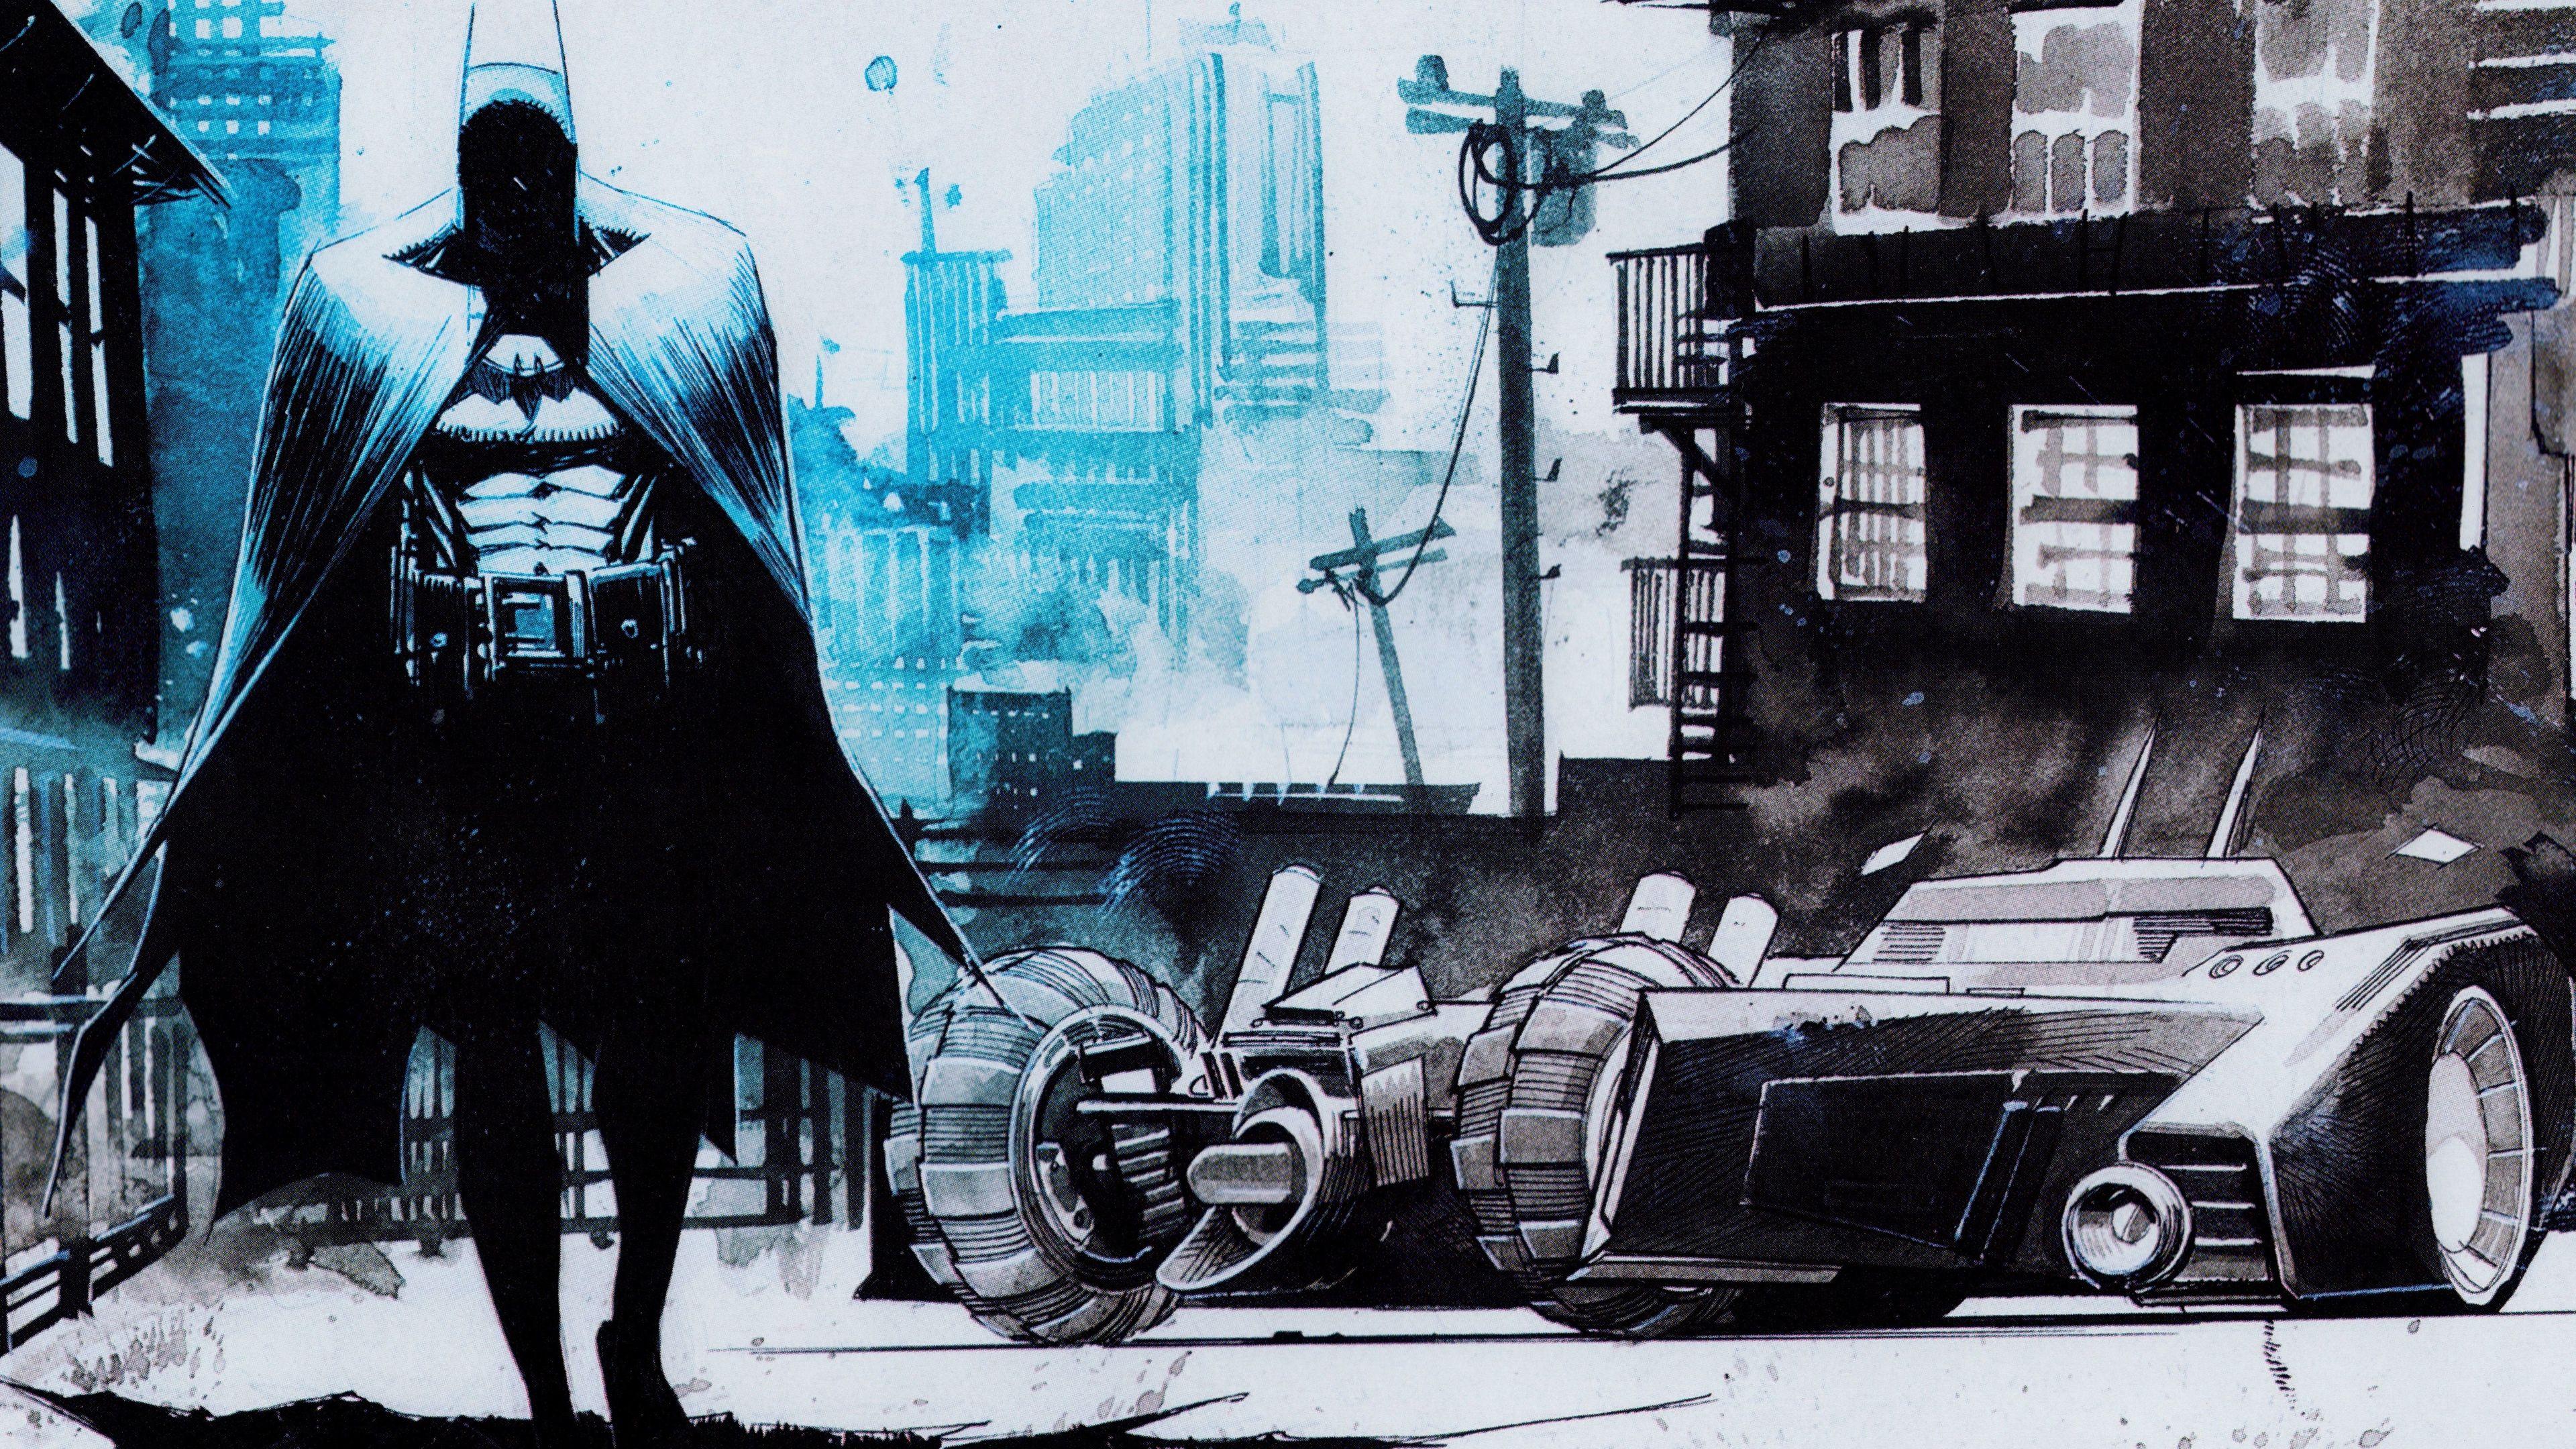 dark knight billionaire detective batman 4k 1553071685 - Dark Knight Billionaire Detective Batman 4k - superheroes wallpapers, hd-wallpapers, digital art wallpapers, batman wallpapers, artwork wallpapers, 5k wallpapers, 4k-wallpapers